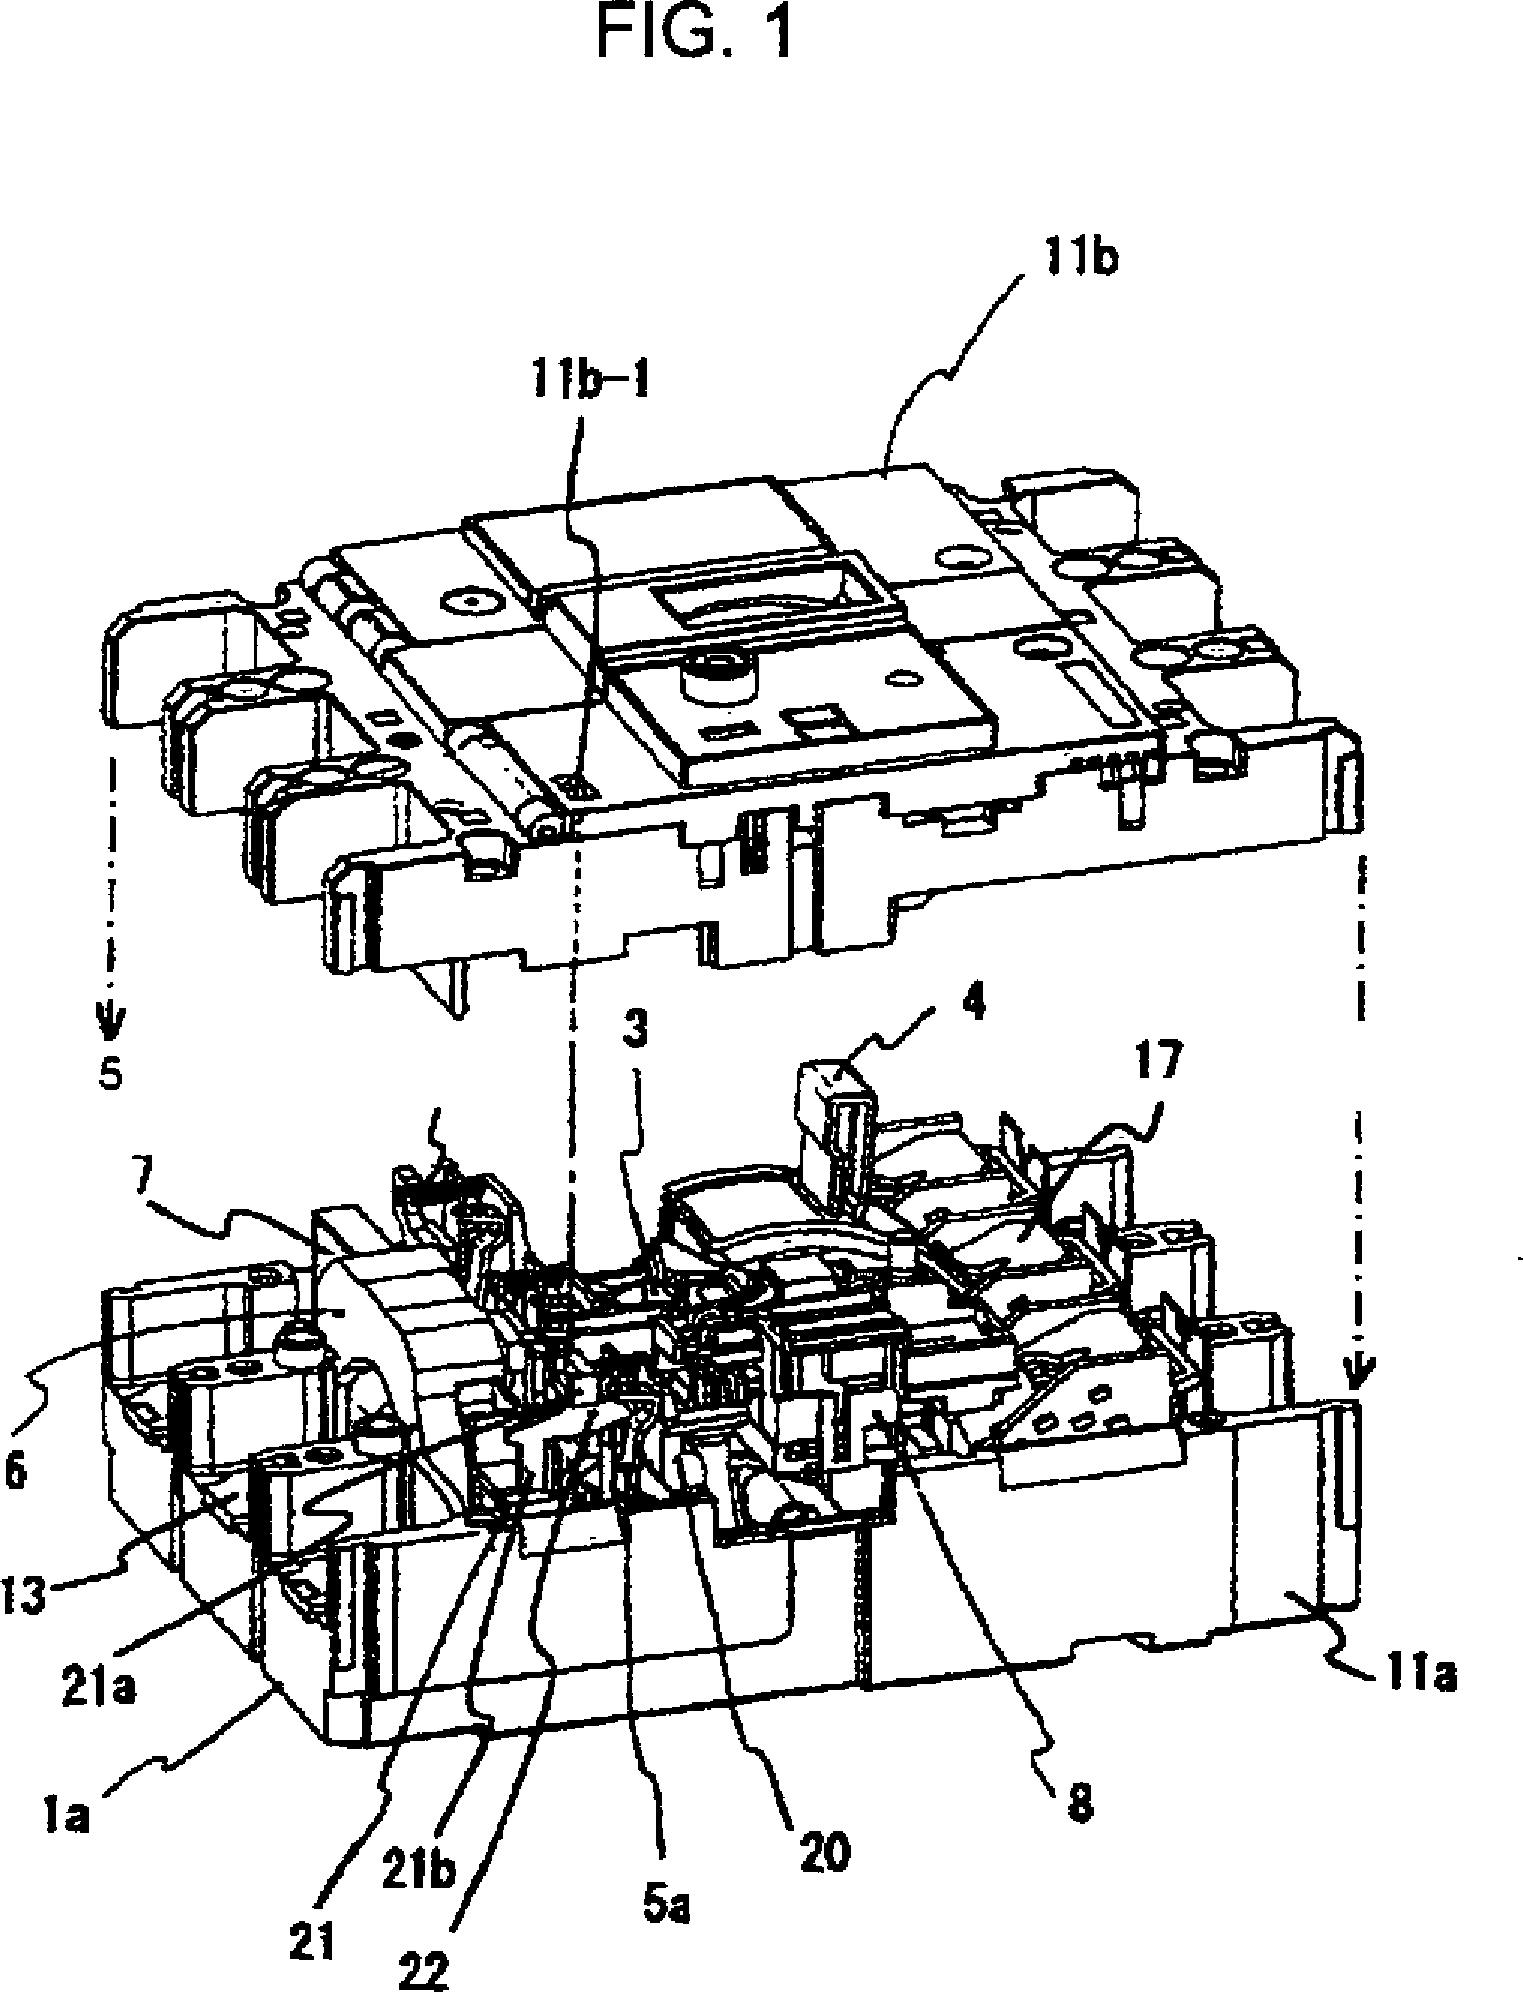 patent de102004024820b4